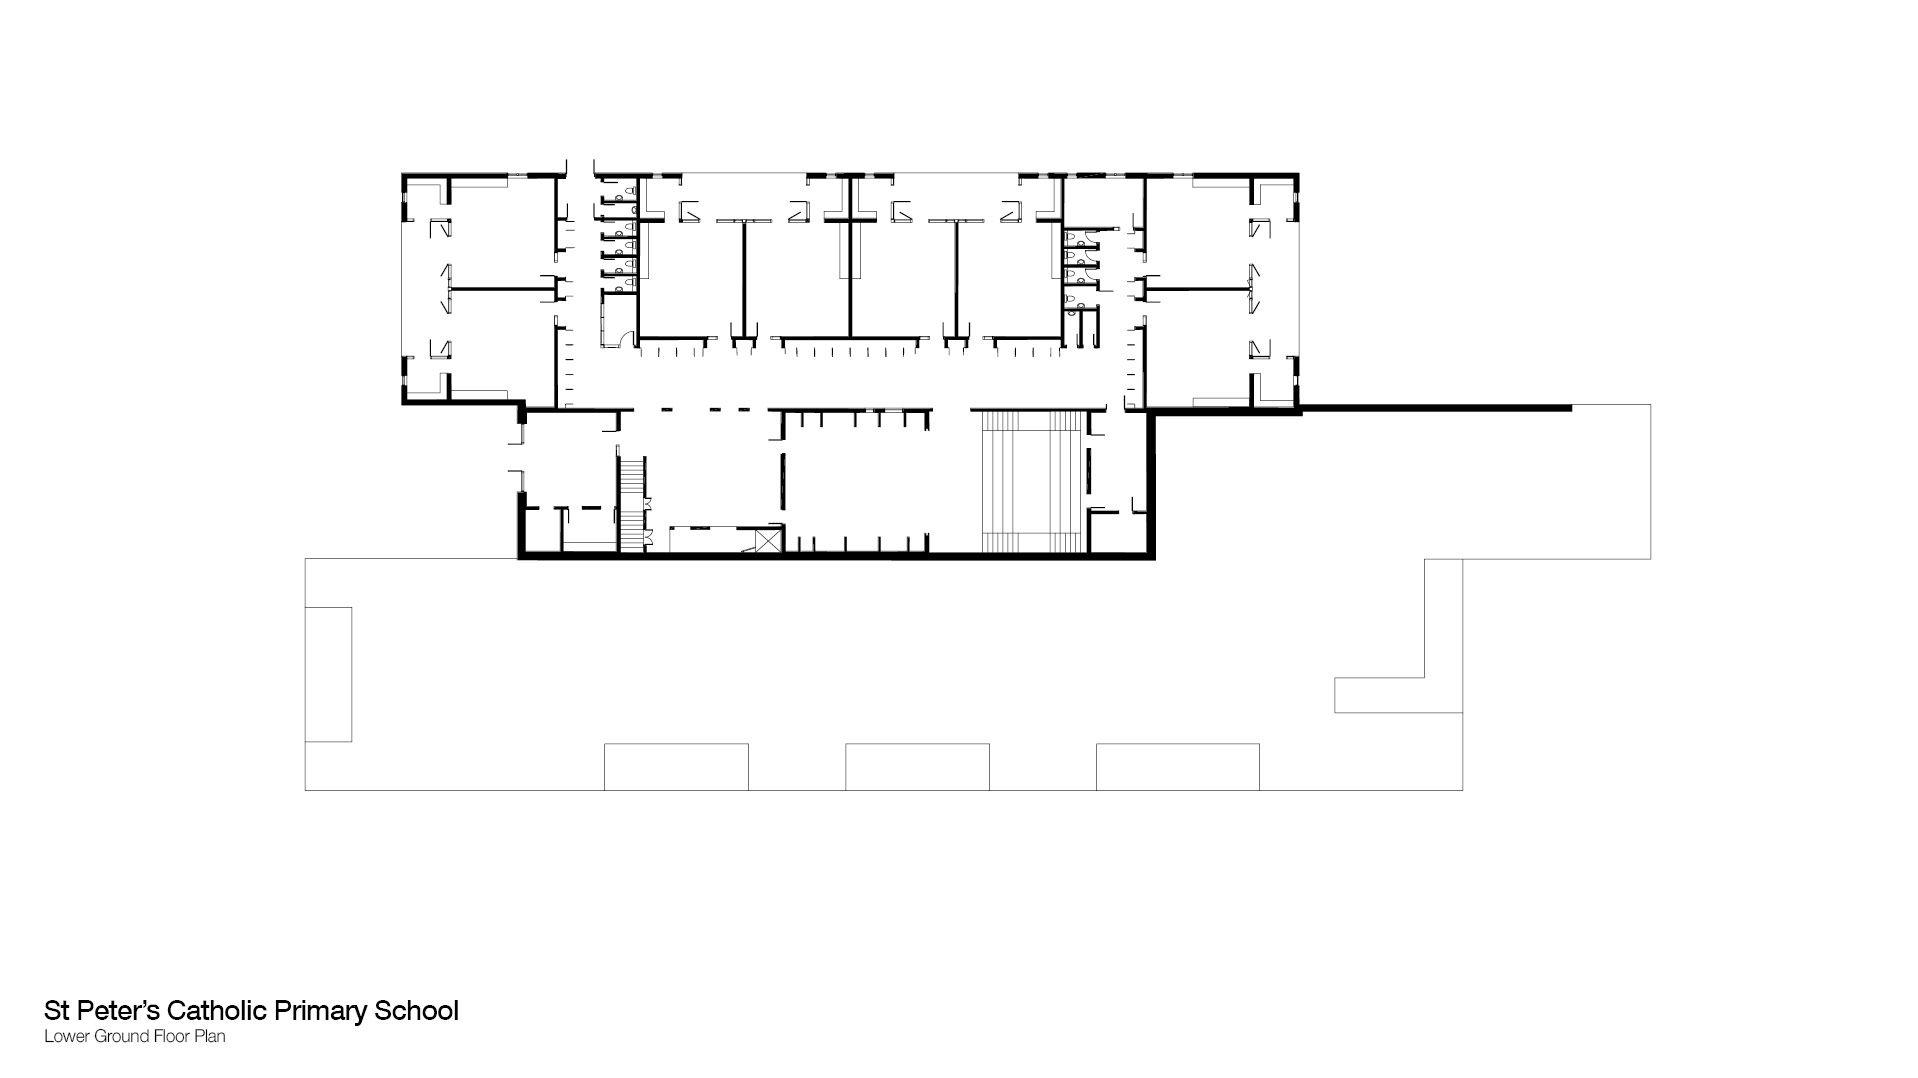 St Peter s Catholic Primary School Upper Ground Floor Plan